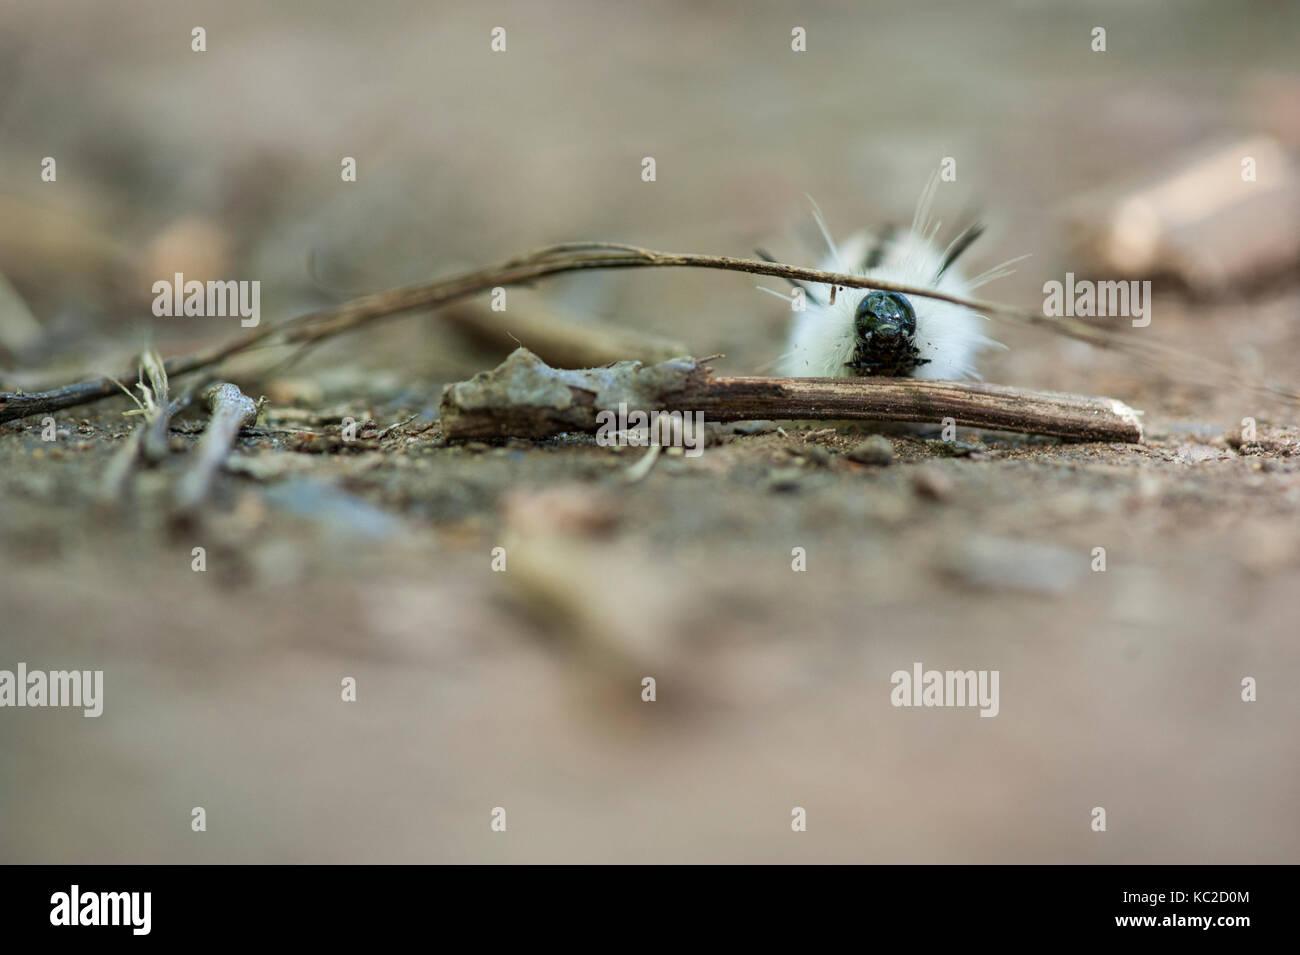 Hickory Tussock Caterpillar - Stock Image